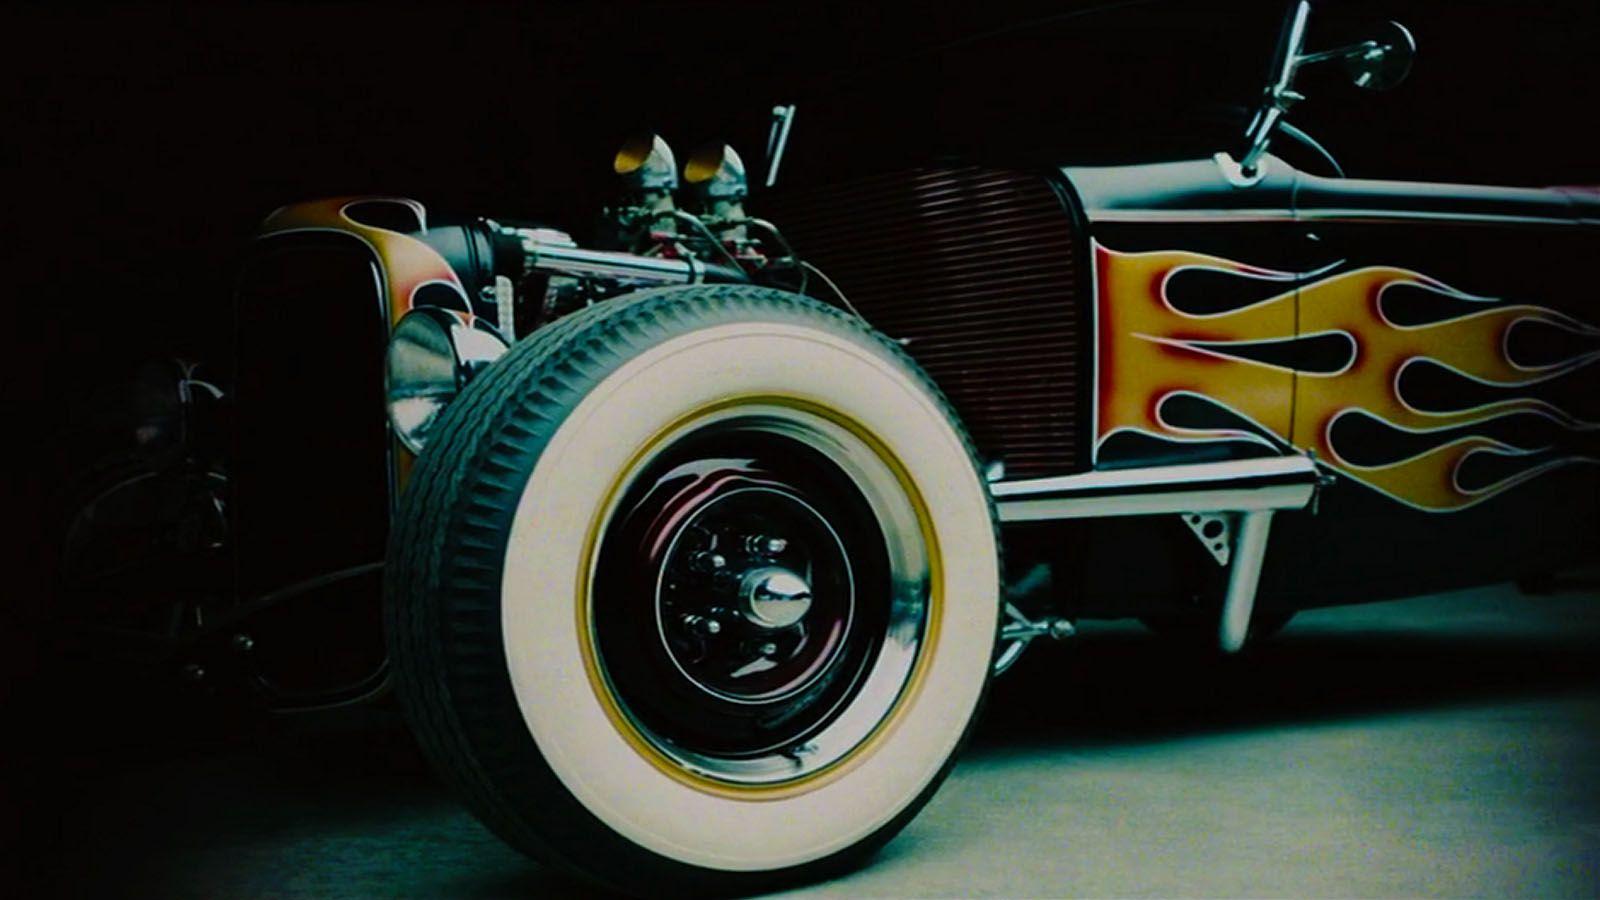 Hotrod Ironman Wallpaper Hot Rods Hot Rods Cars Car